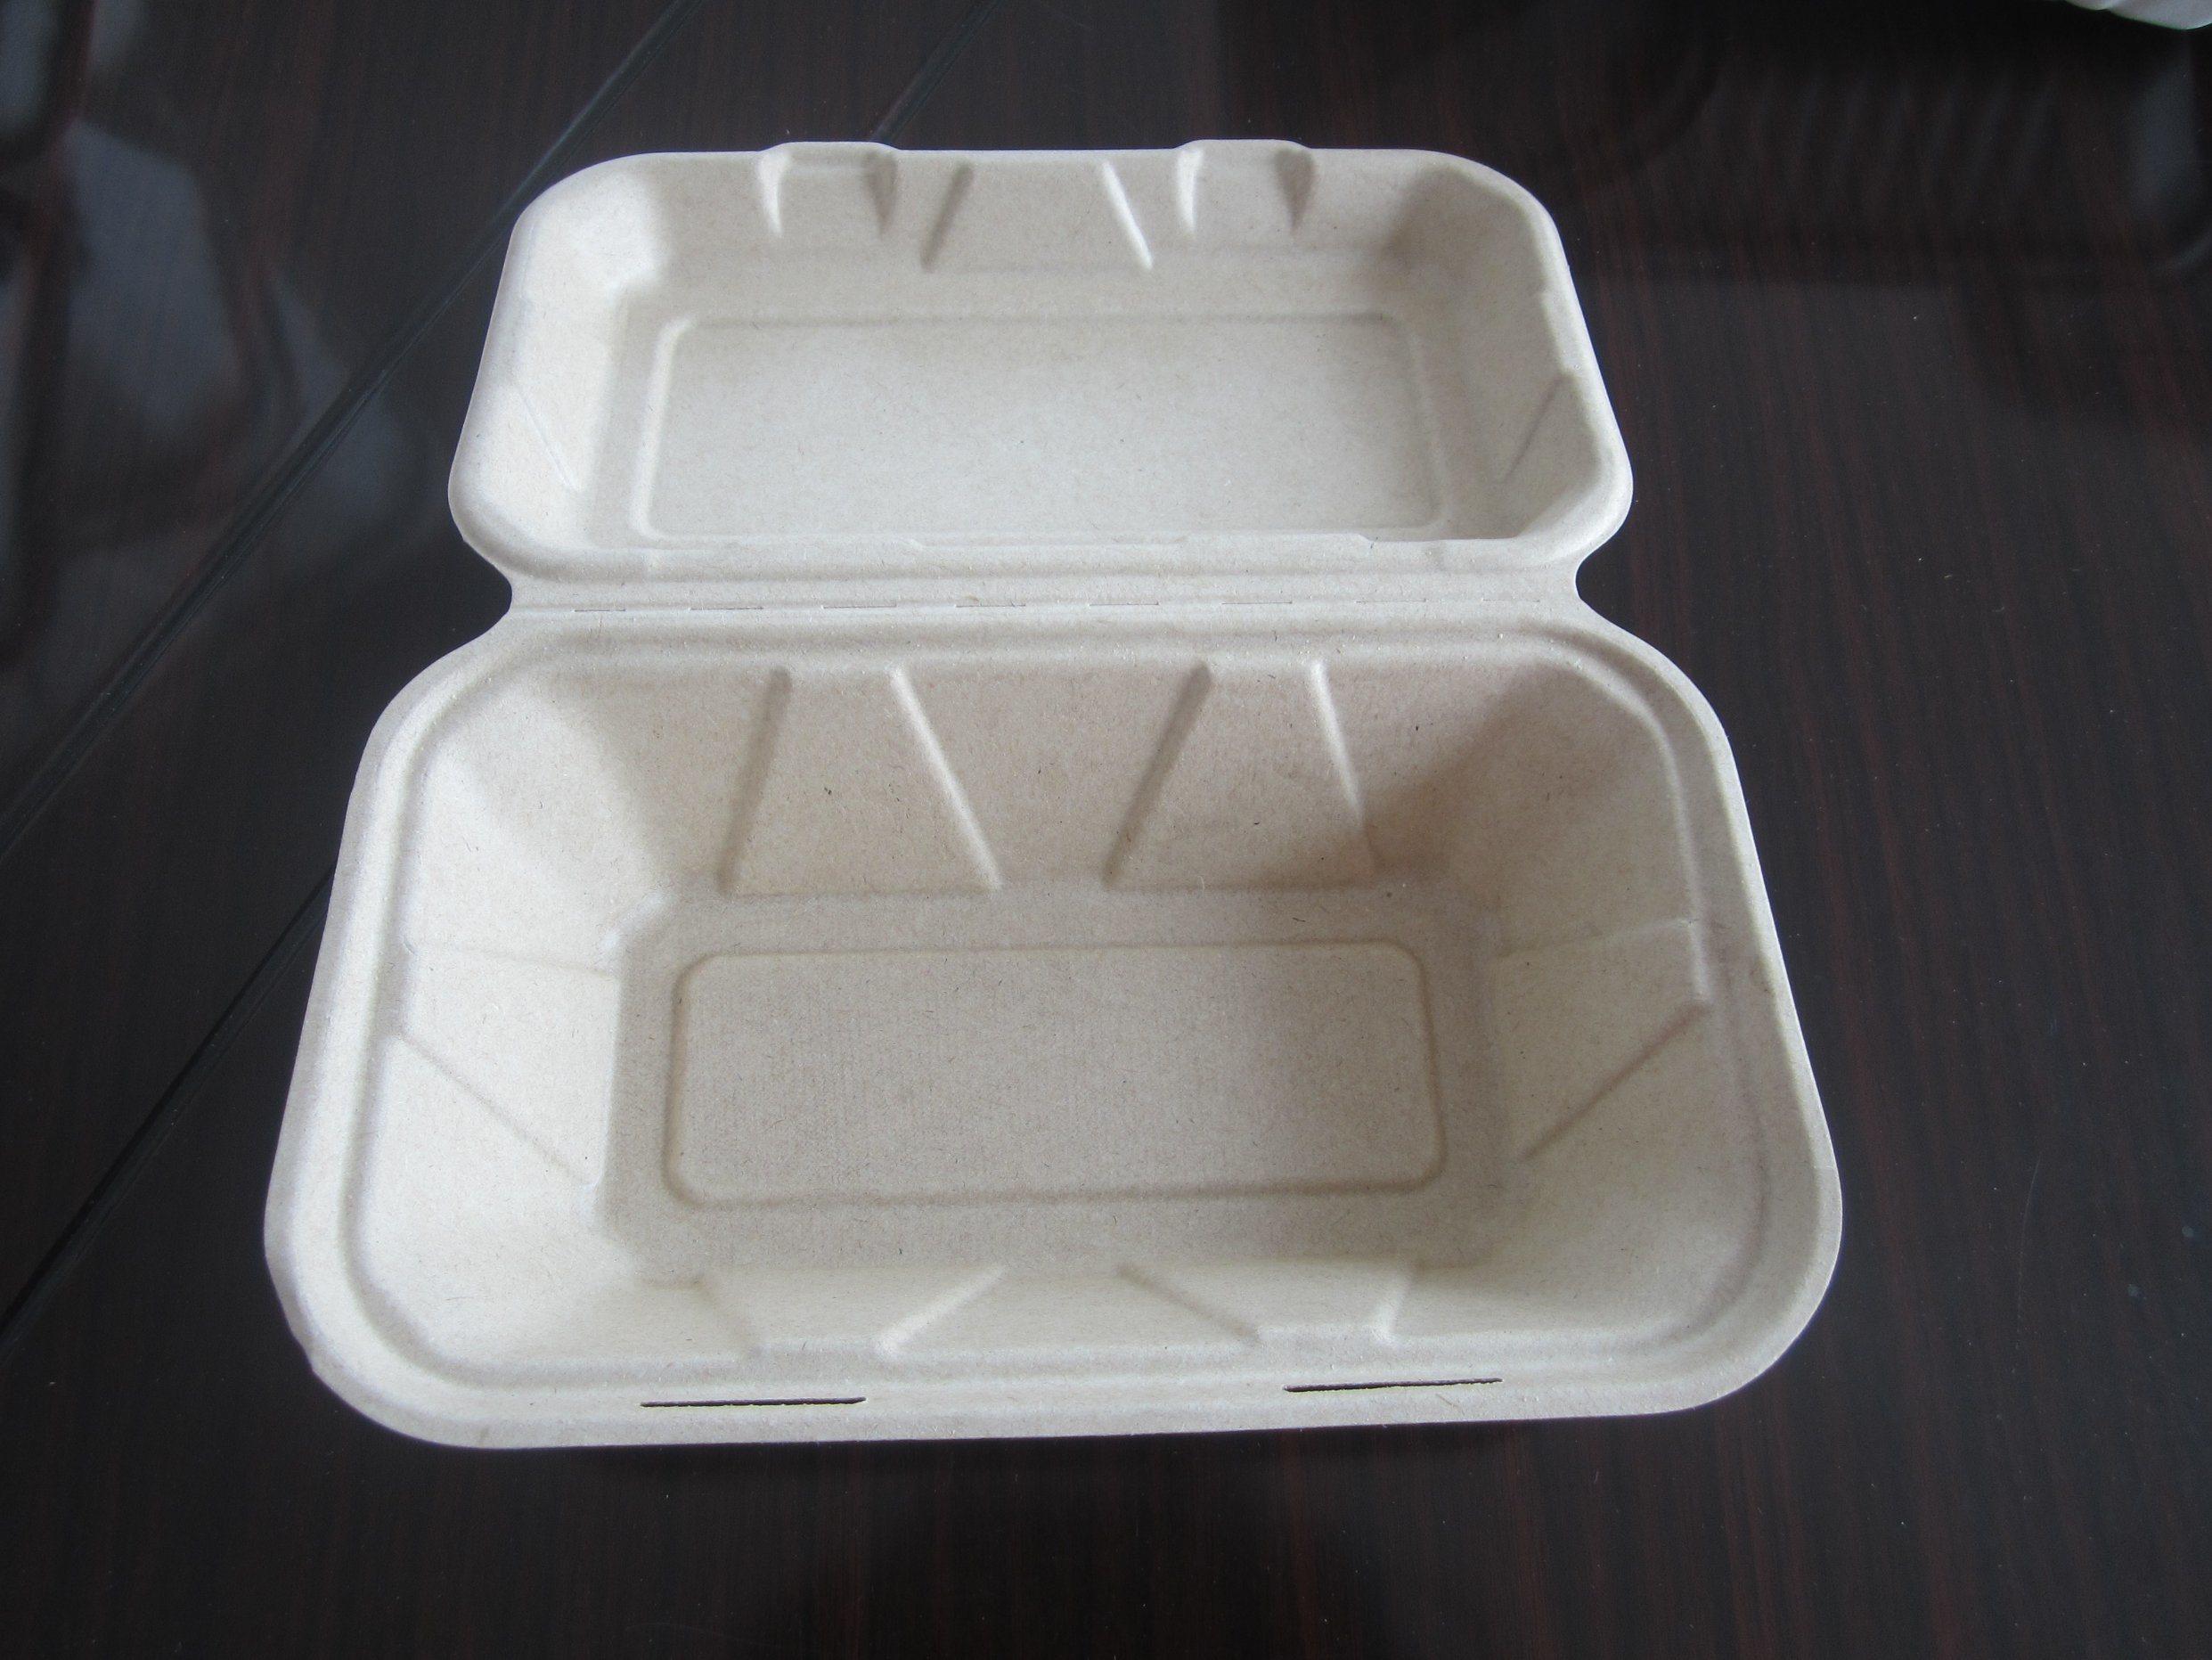 9X6X3 Composable Sugarcane Hamburger Box